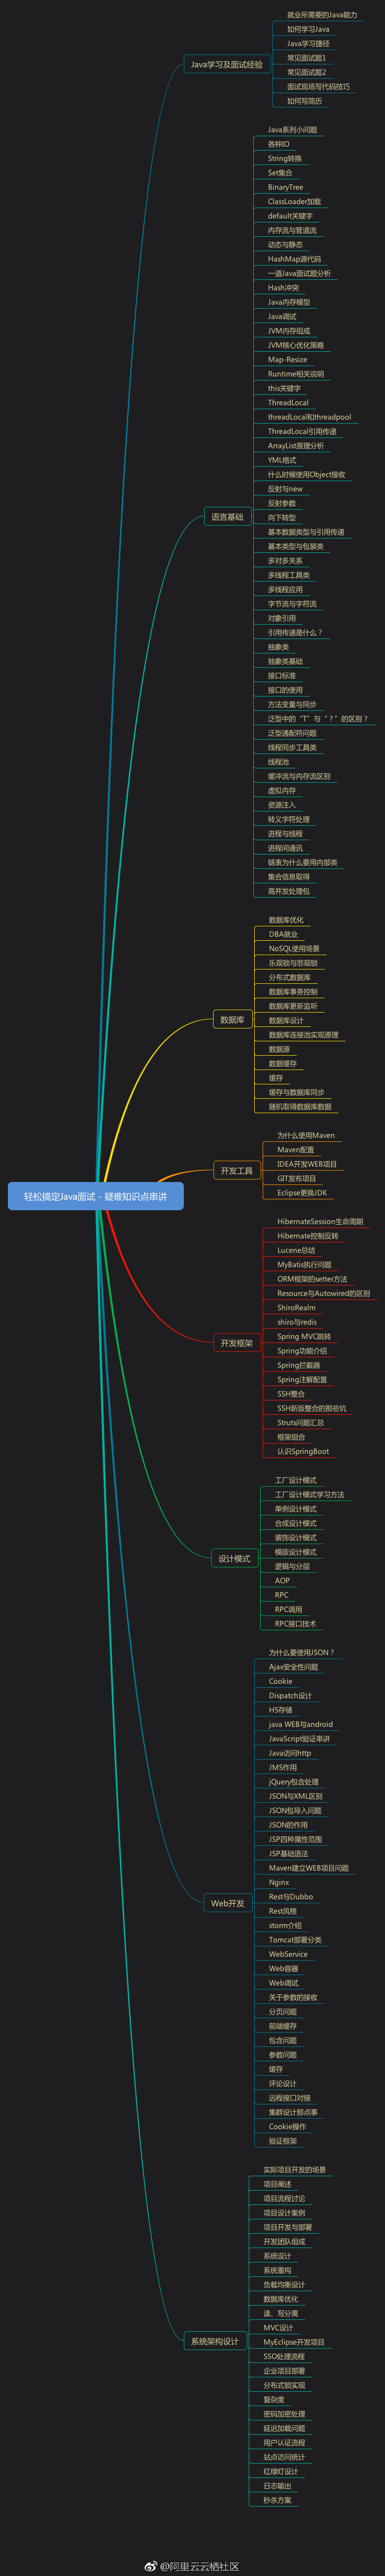 Java架构师的学习路线